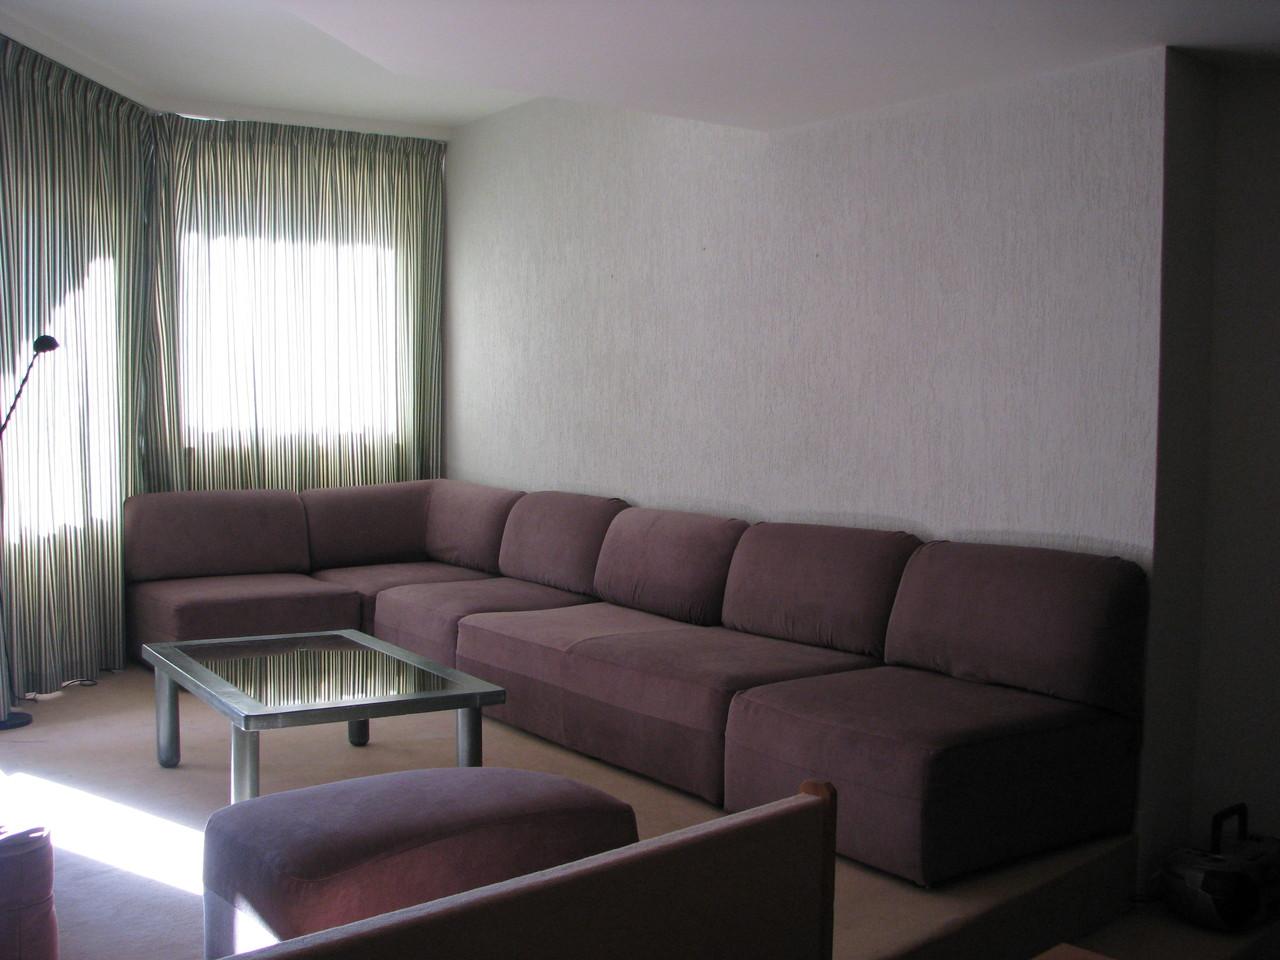 Housse canapé tissu Amara spécial siège